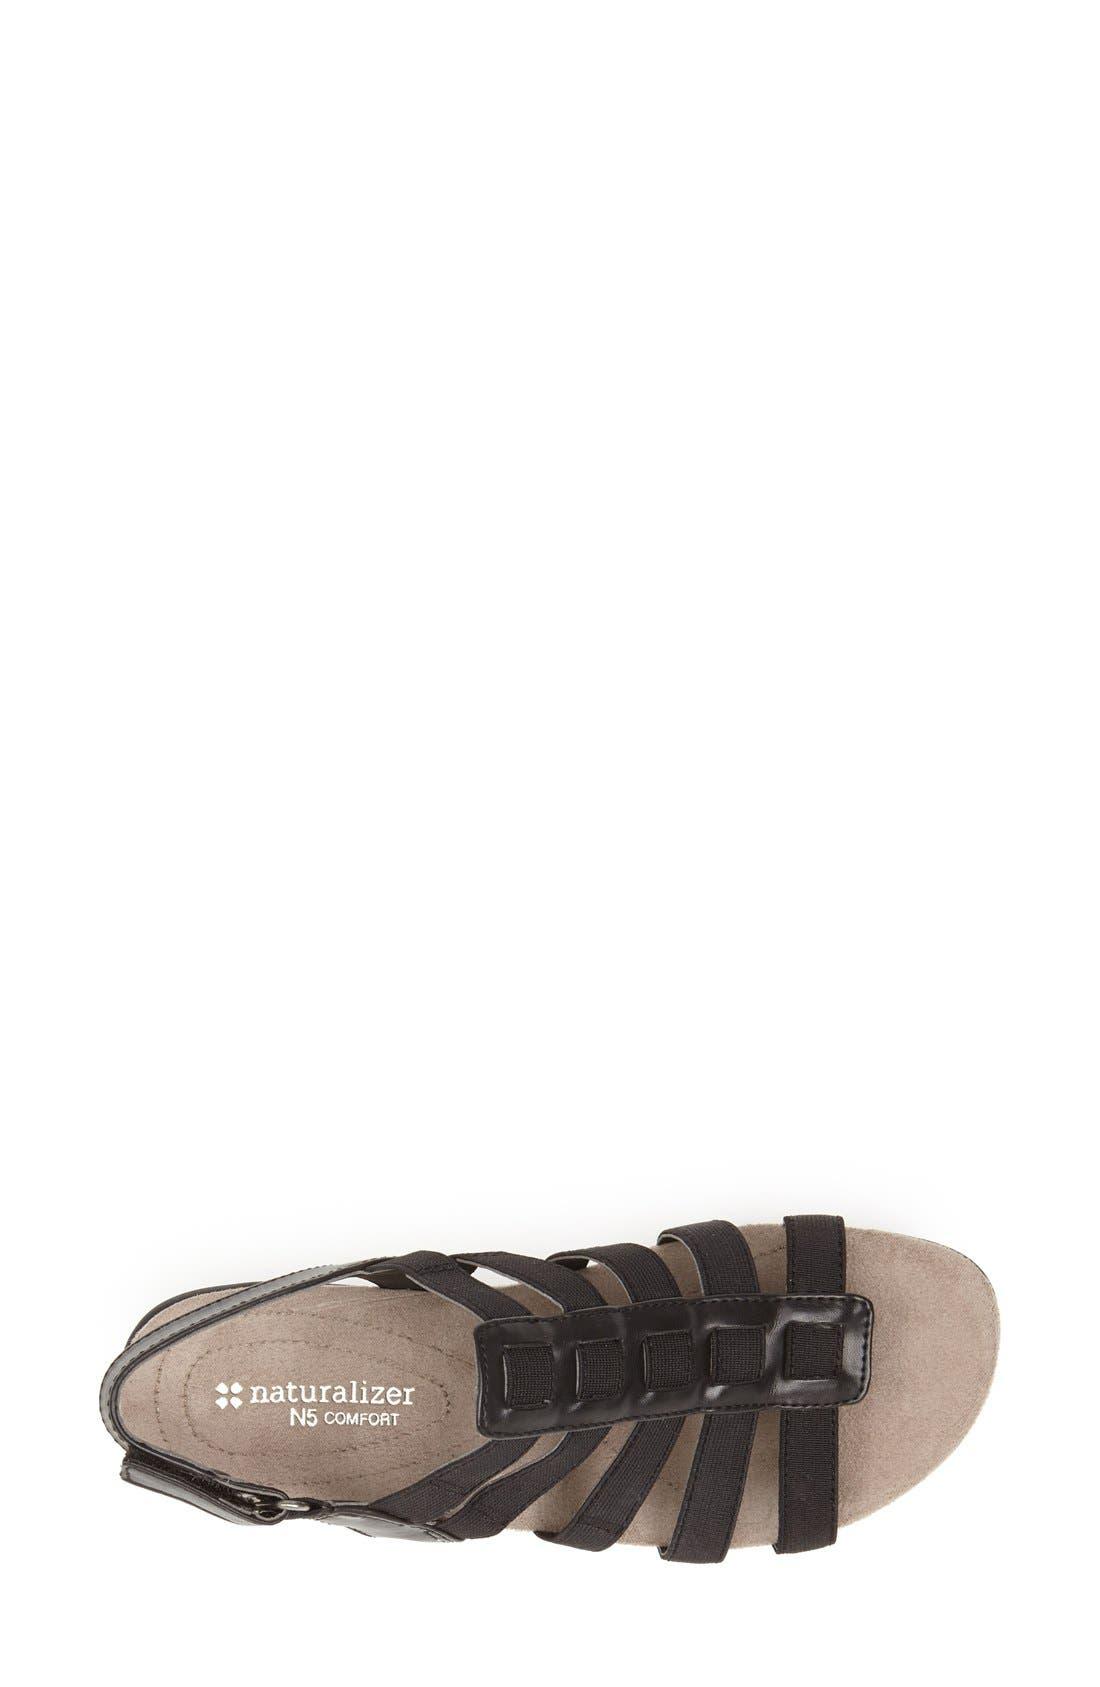 Alternate Image 3  - Naturalizer 'Wyonna' Leather Sandal (Women)